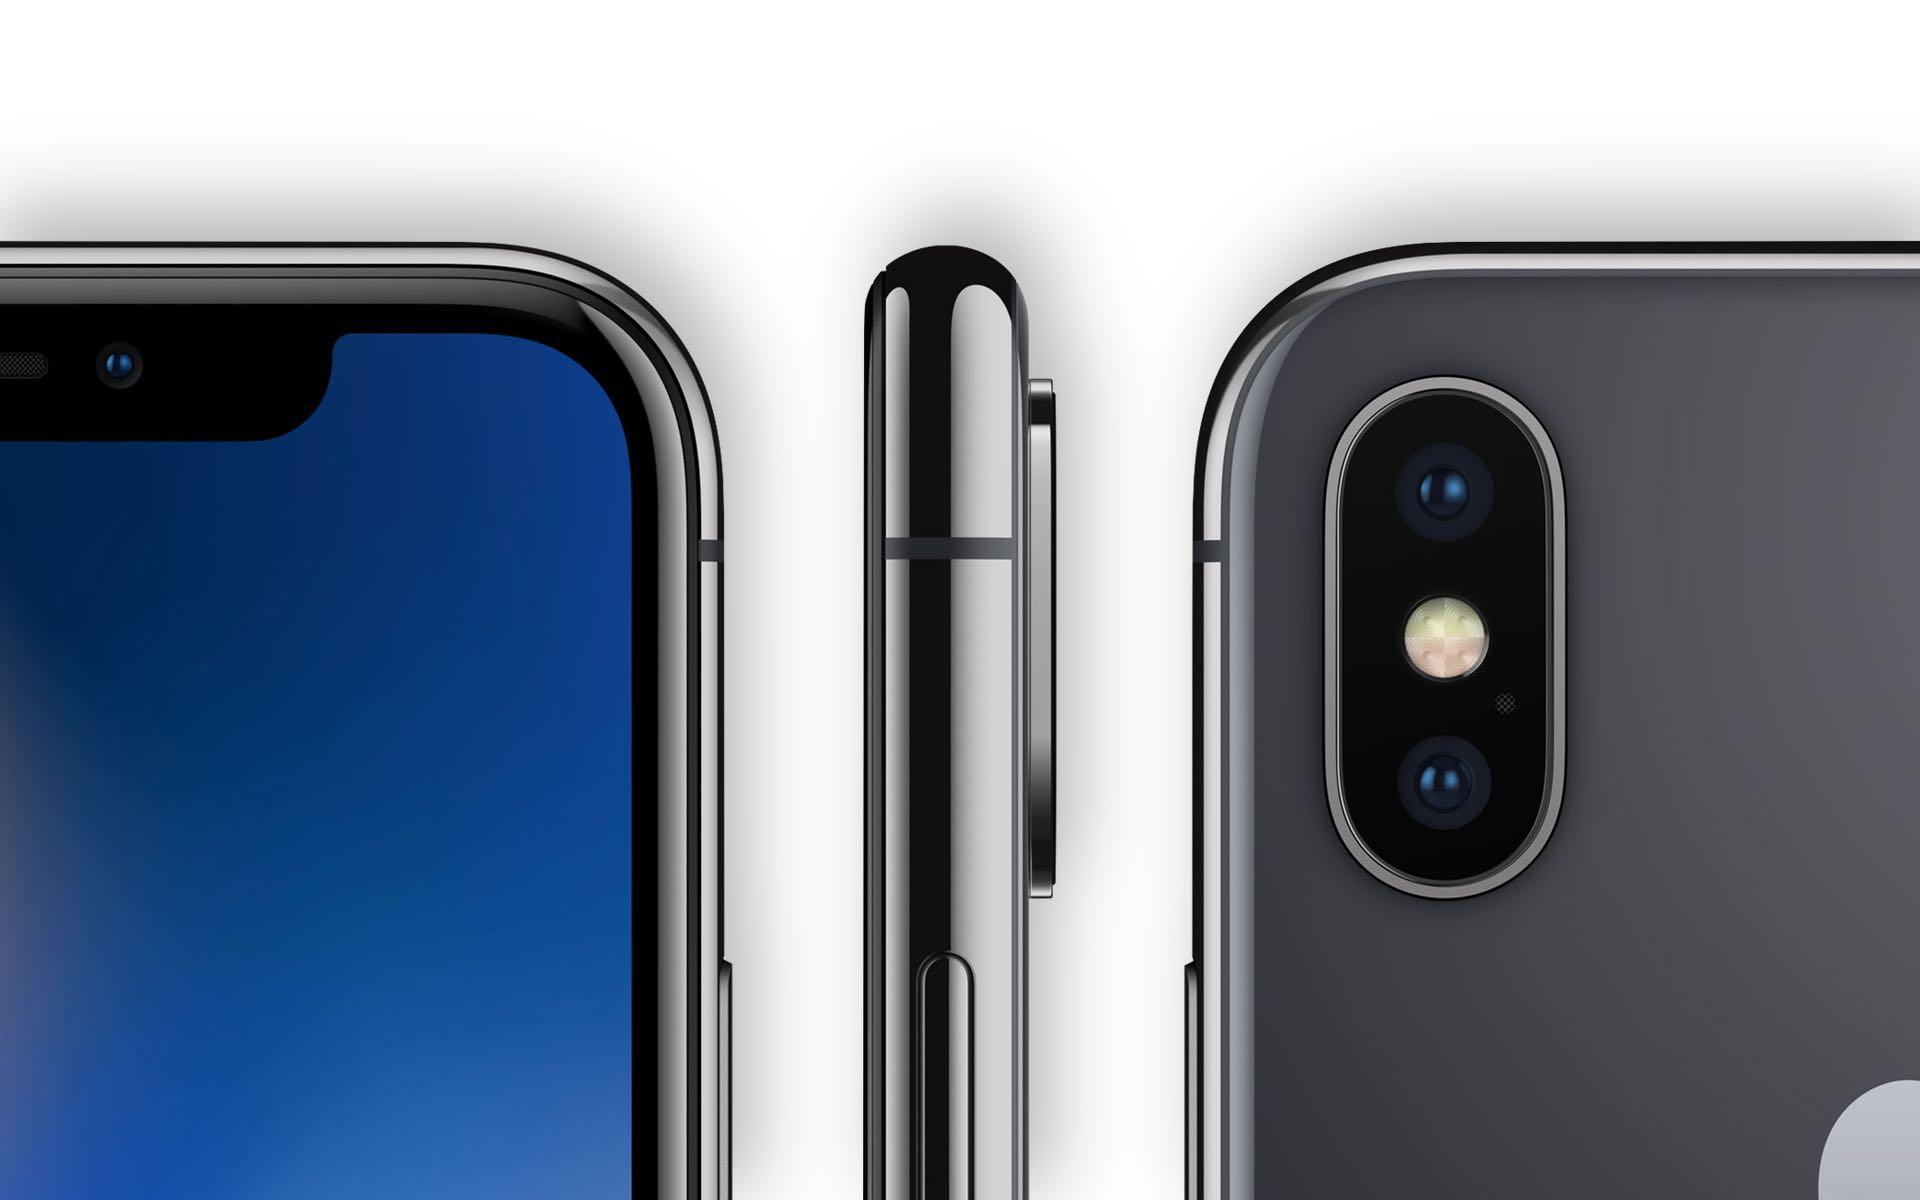 iPhoneXStainless